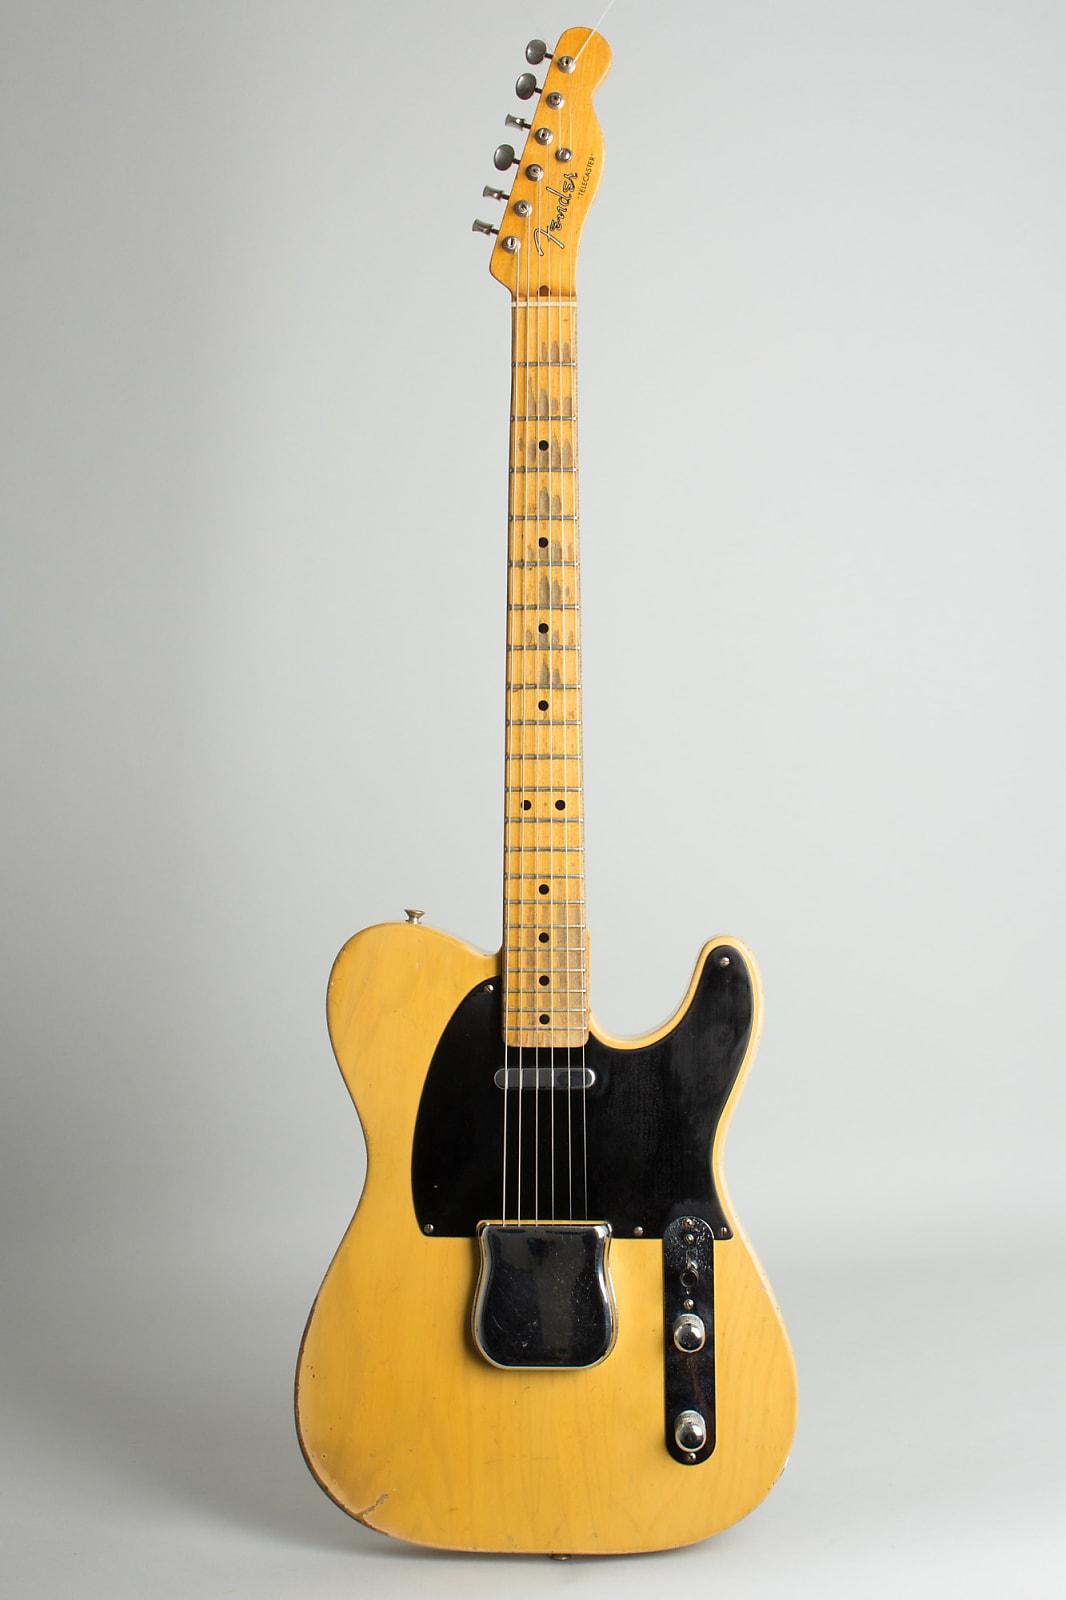 Fender  Telecaster Solid Body Electric Guitar (1952), ser. #2680, original brown hard shell case.